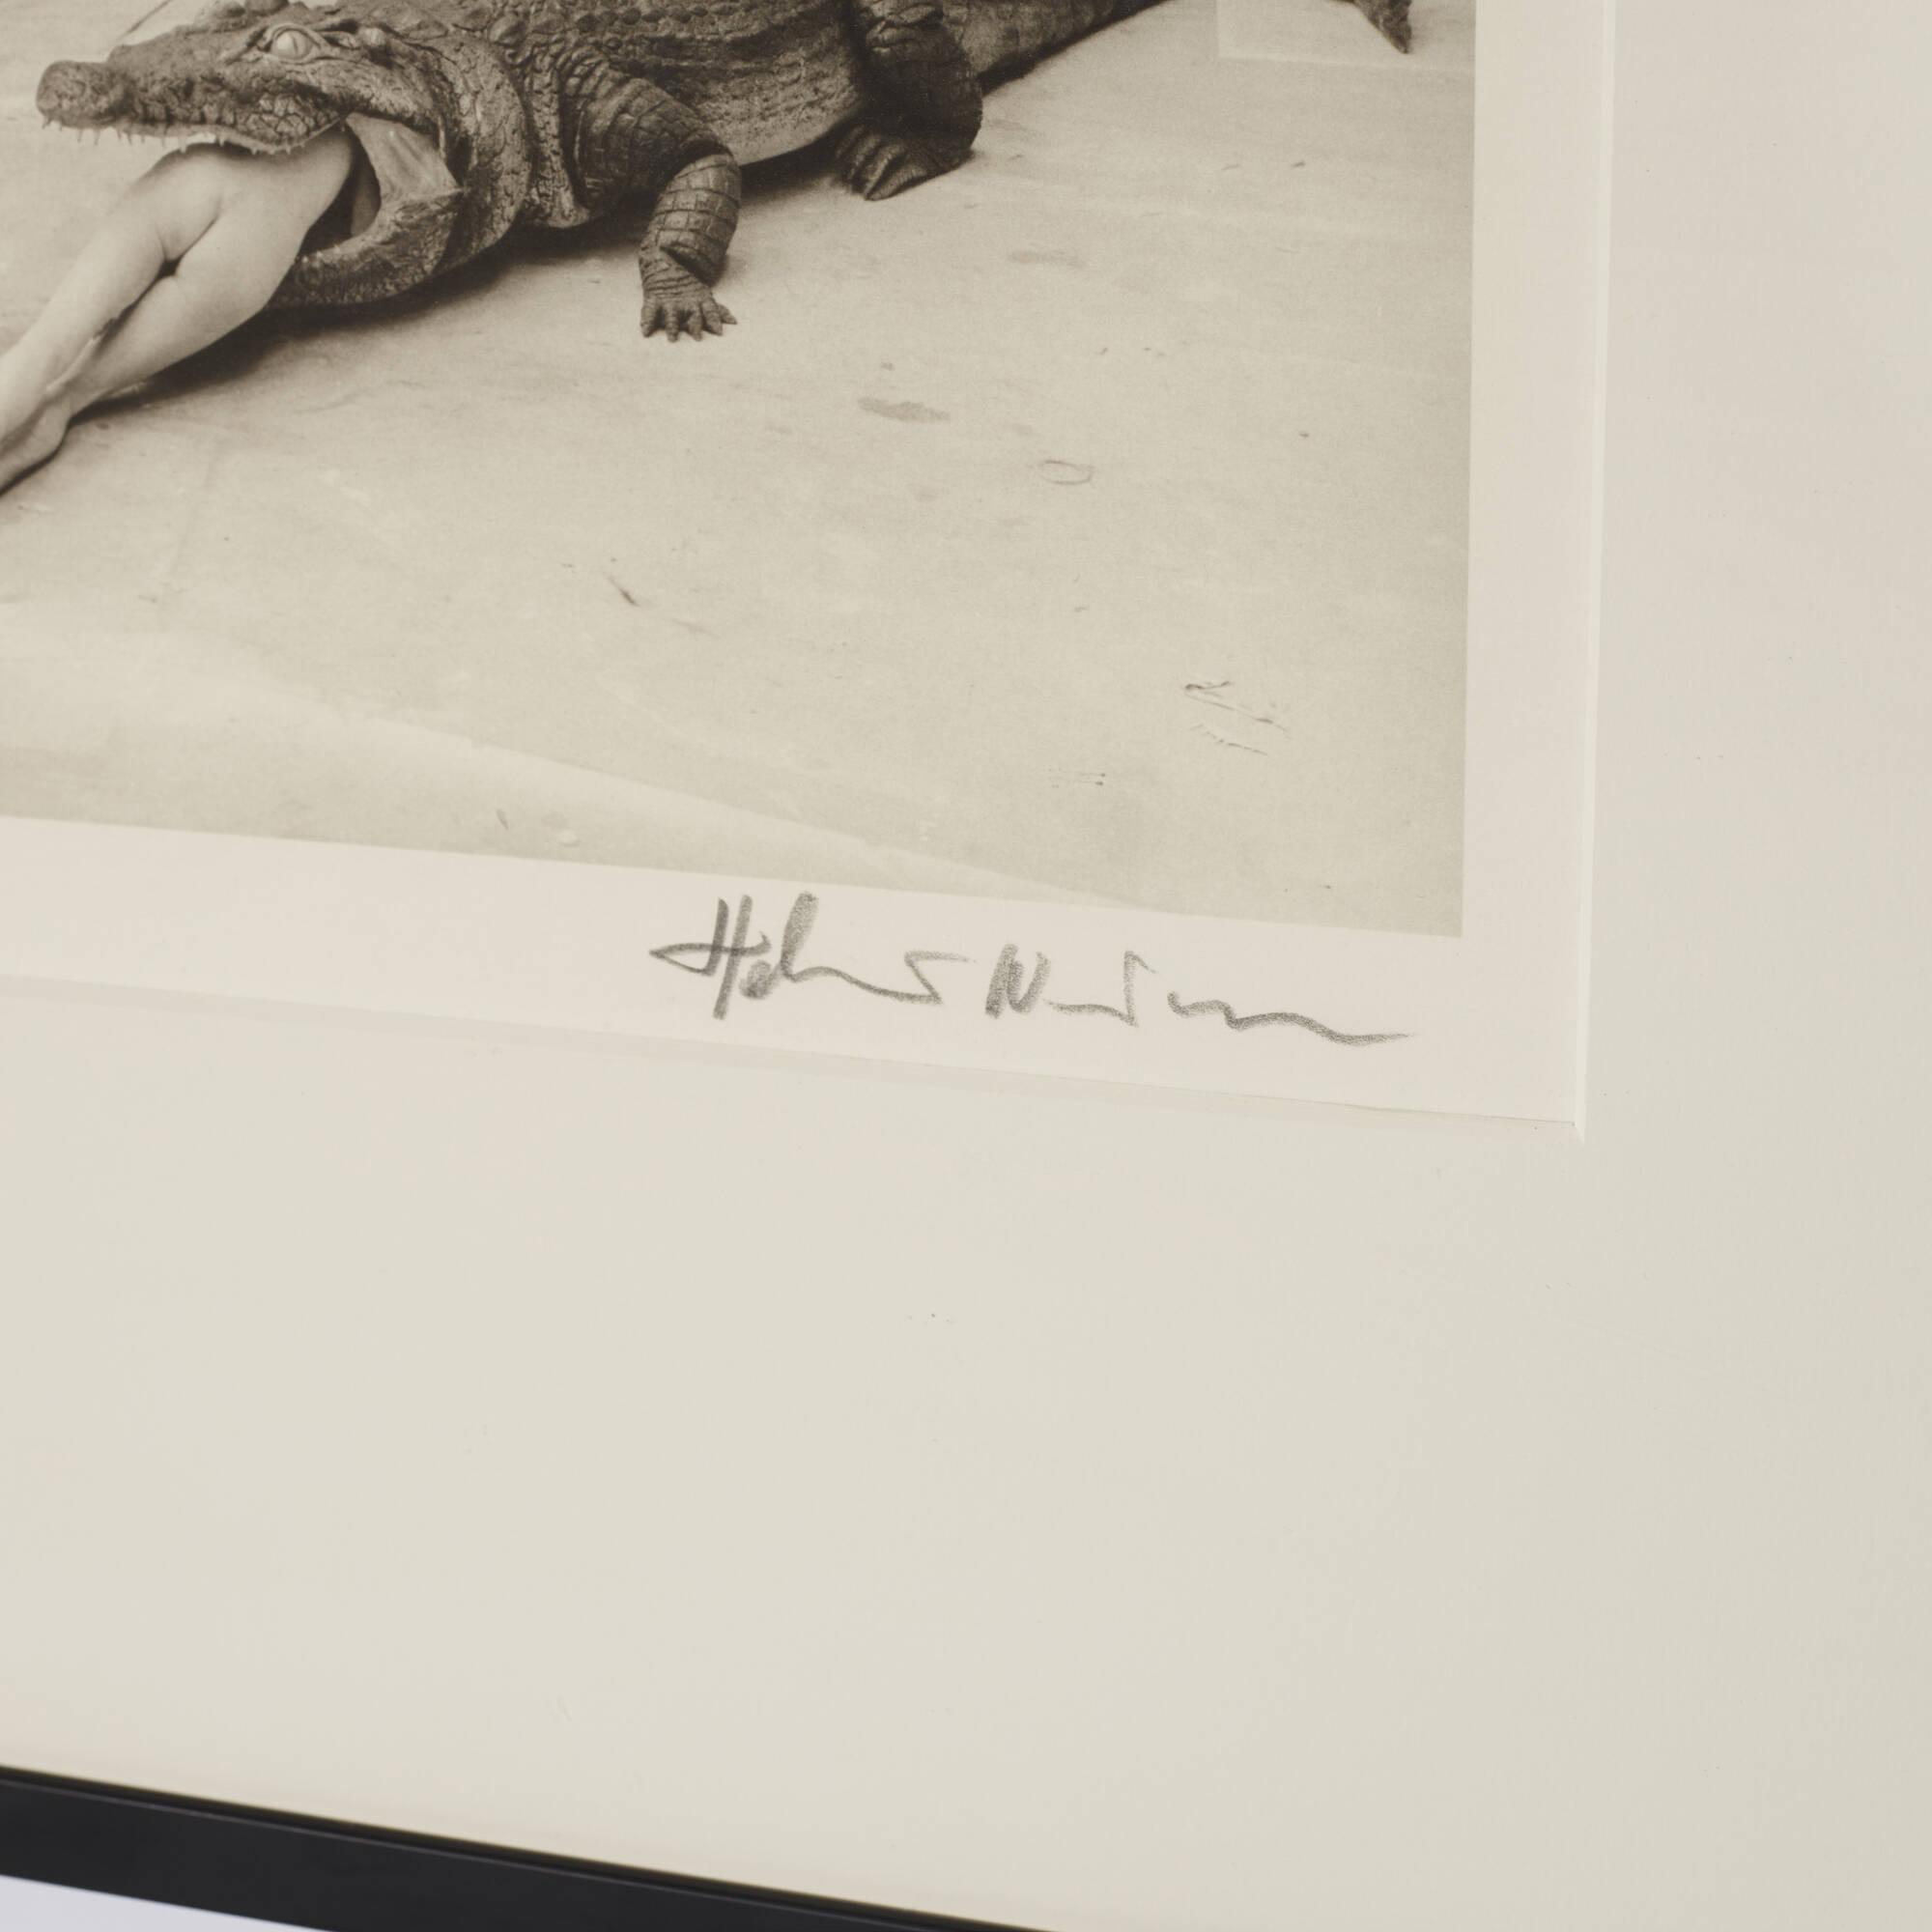 292: Helmut Newton / Crocodile Eating Ballerina (3 of 3)